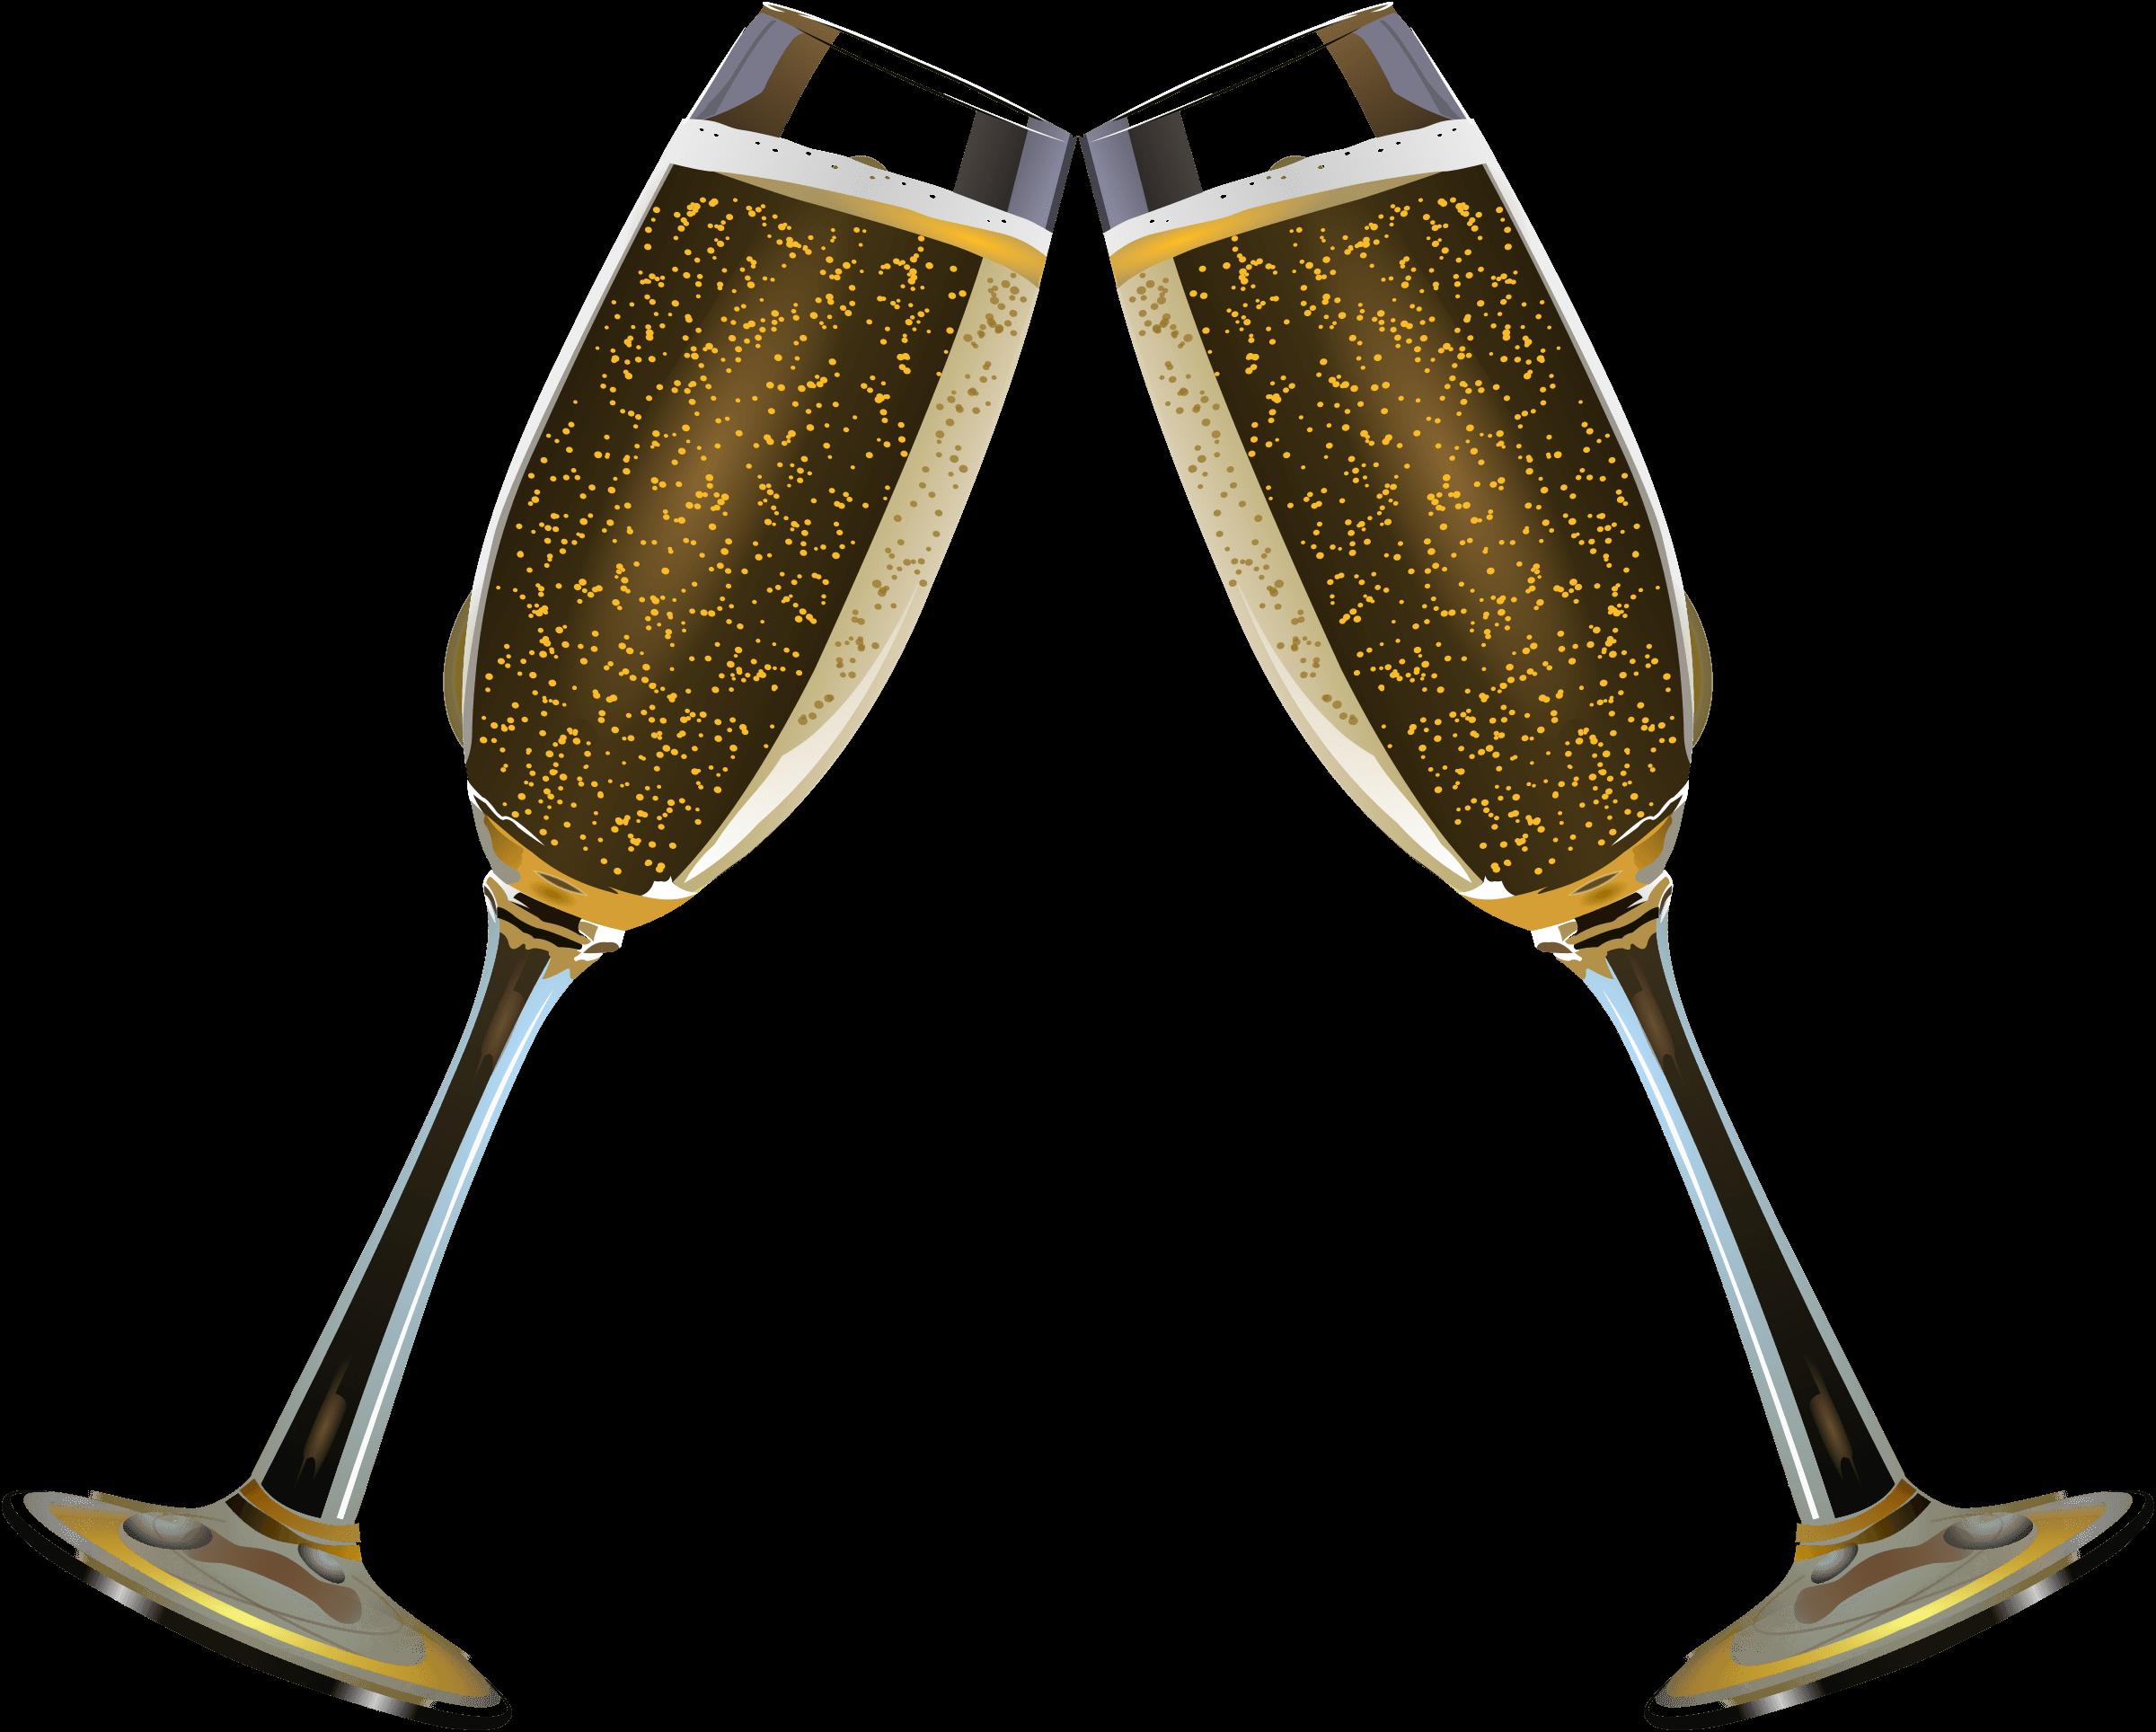 2400x1928 Clip Art Champagne Flute Clip Art